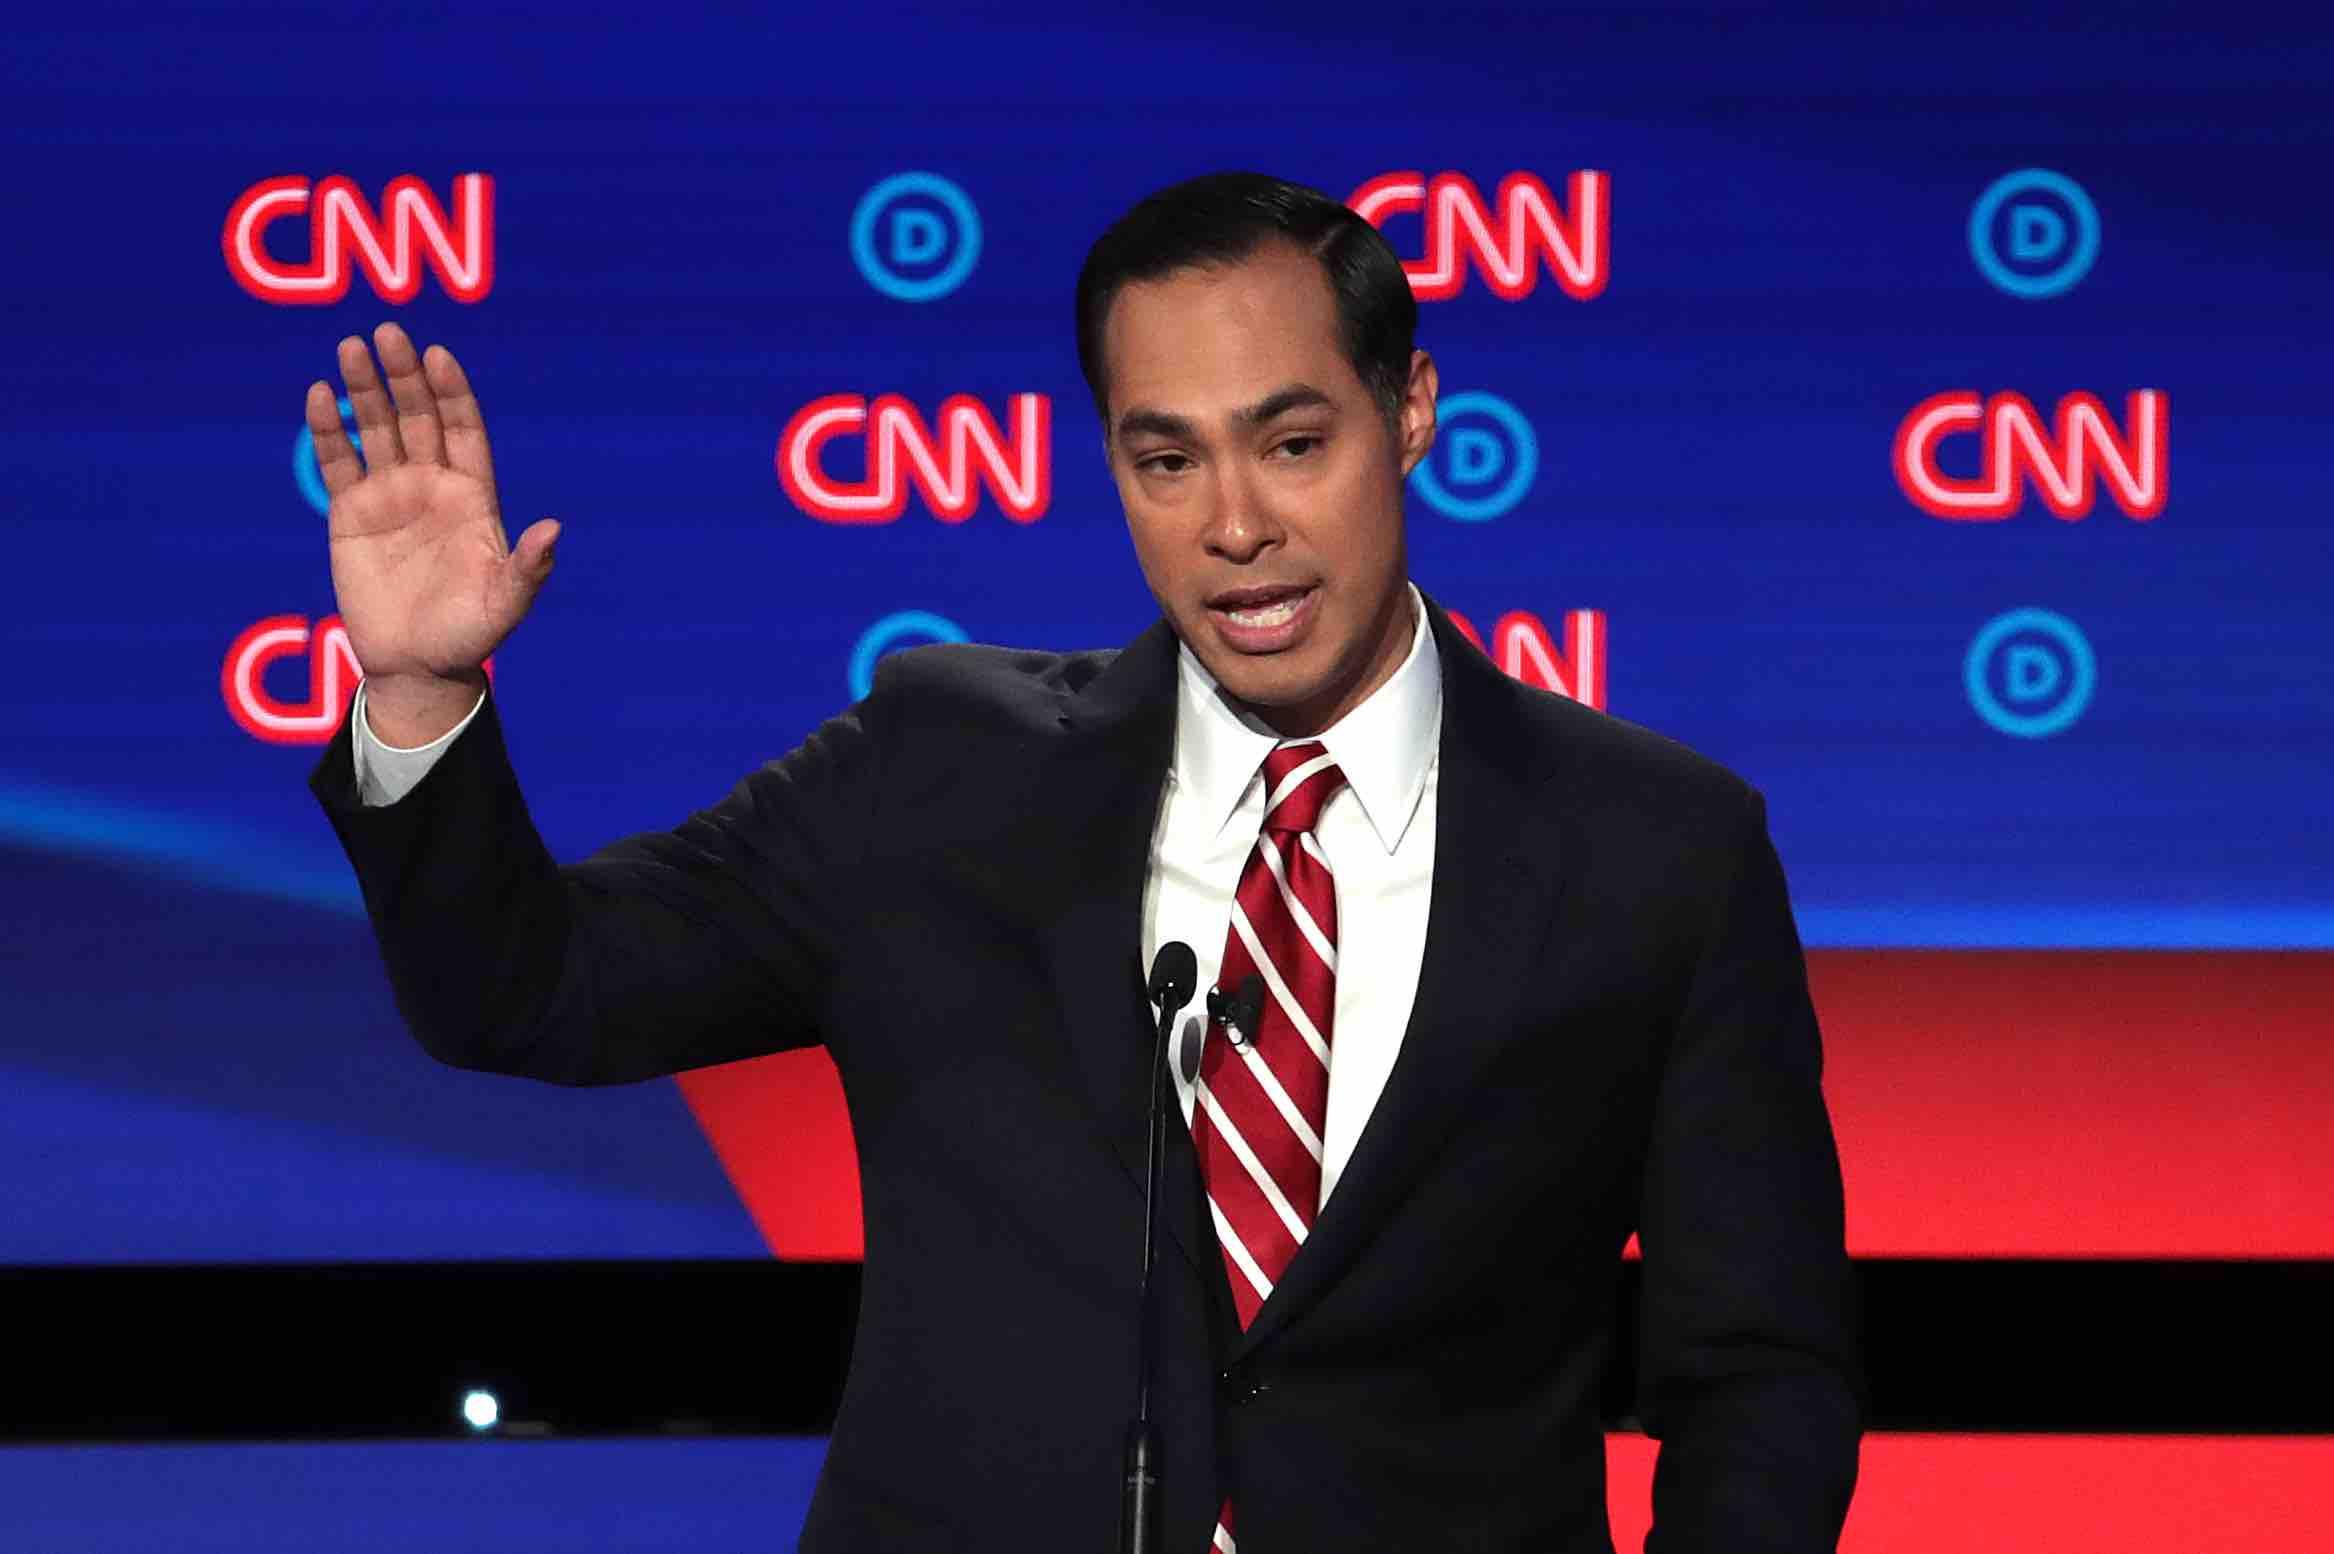 'SNL' Leaving Out Julián Castro From Democratic Debate Sketch Raises Cast Diversity Questions